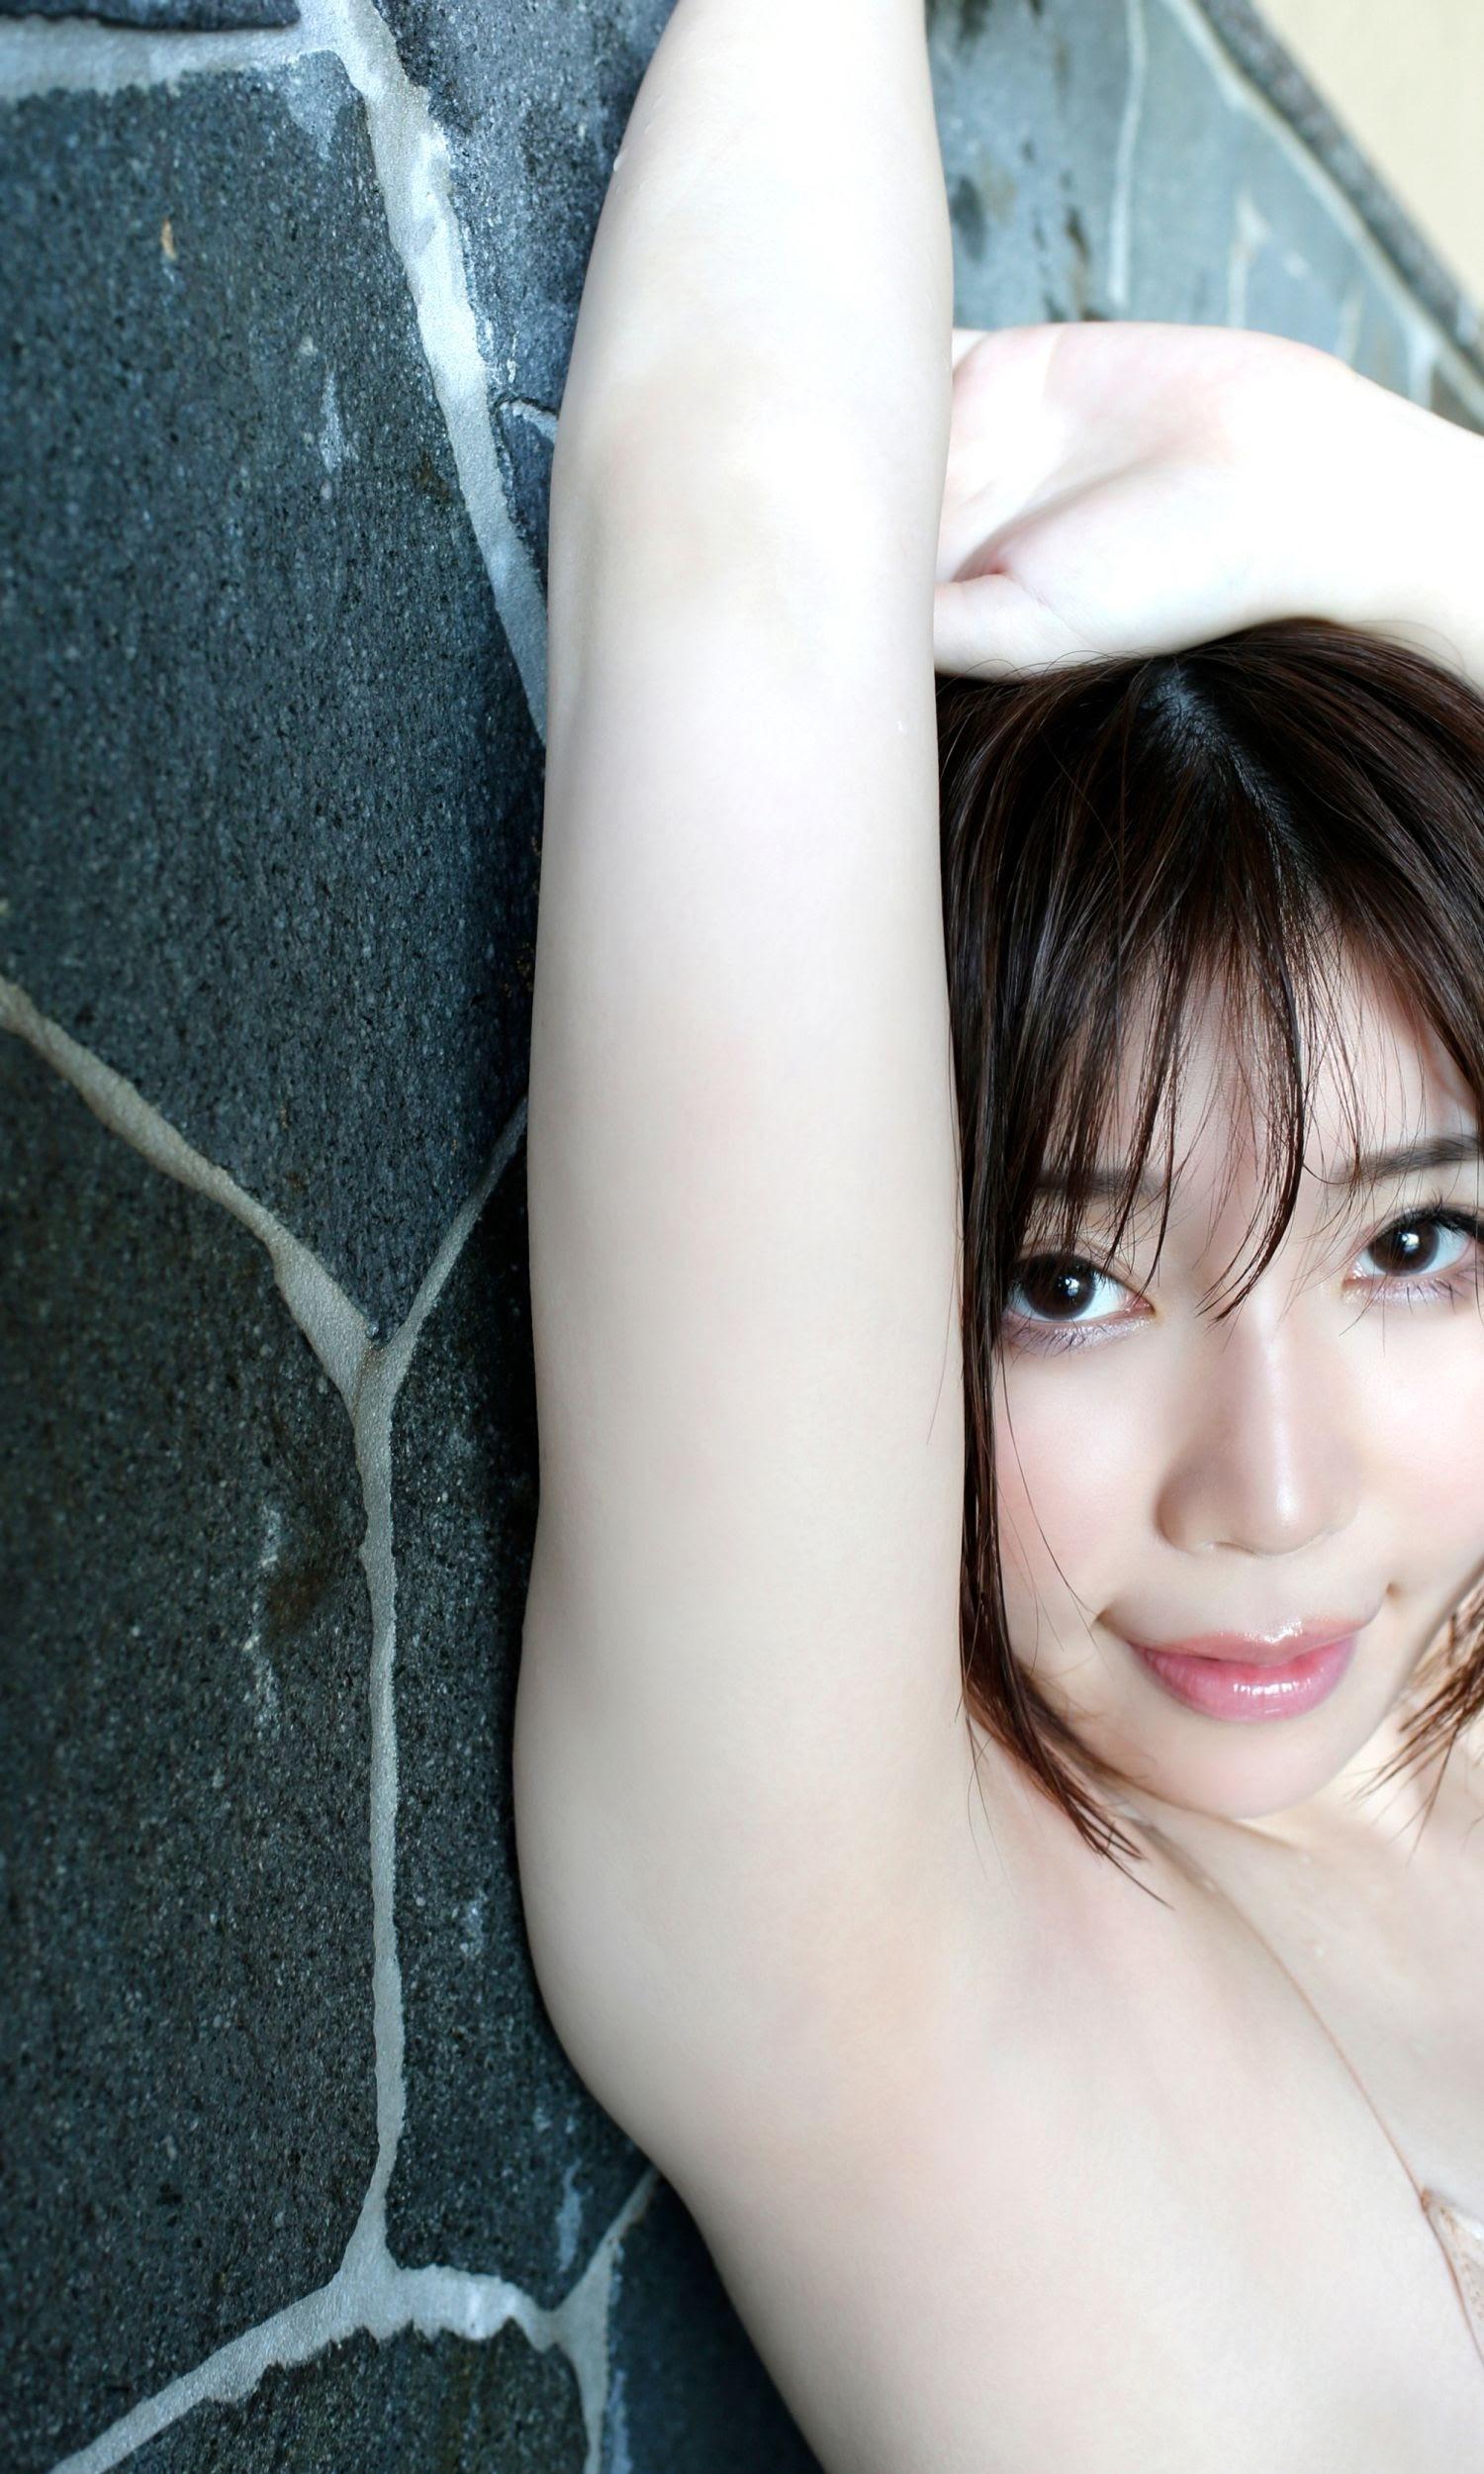 She is popular as a gramador and also an office workerShe has two faces in her amorous bikini gravureYui Furukawa 2020007